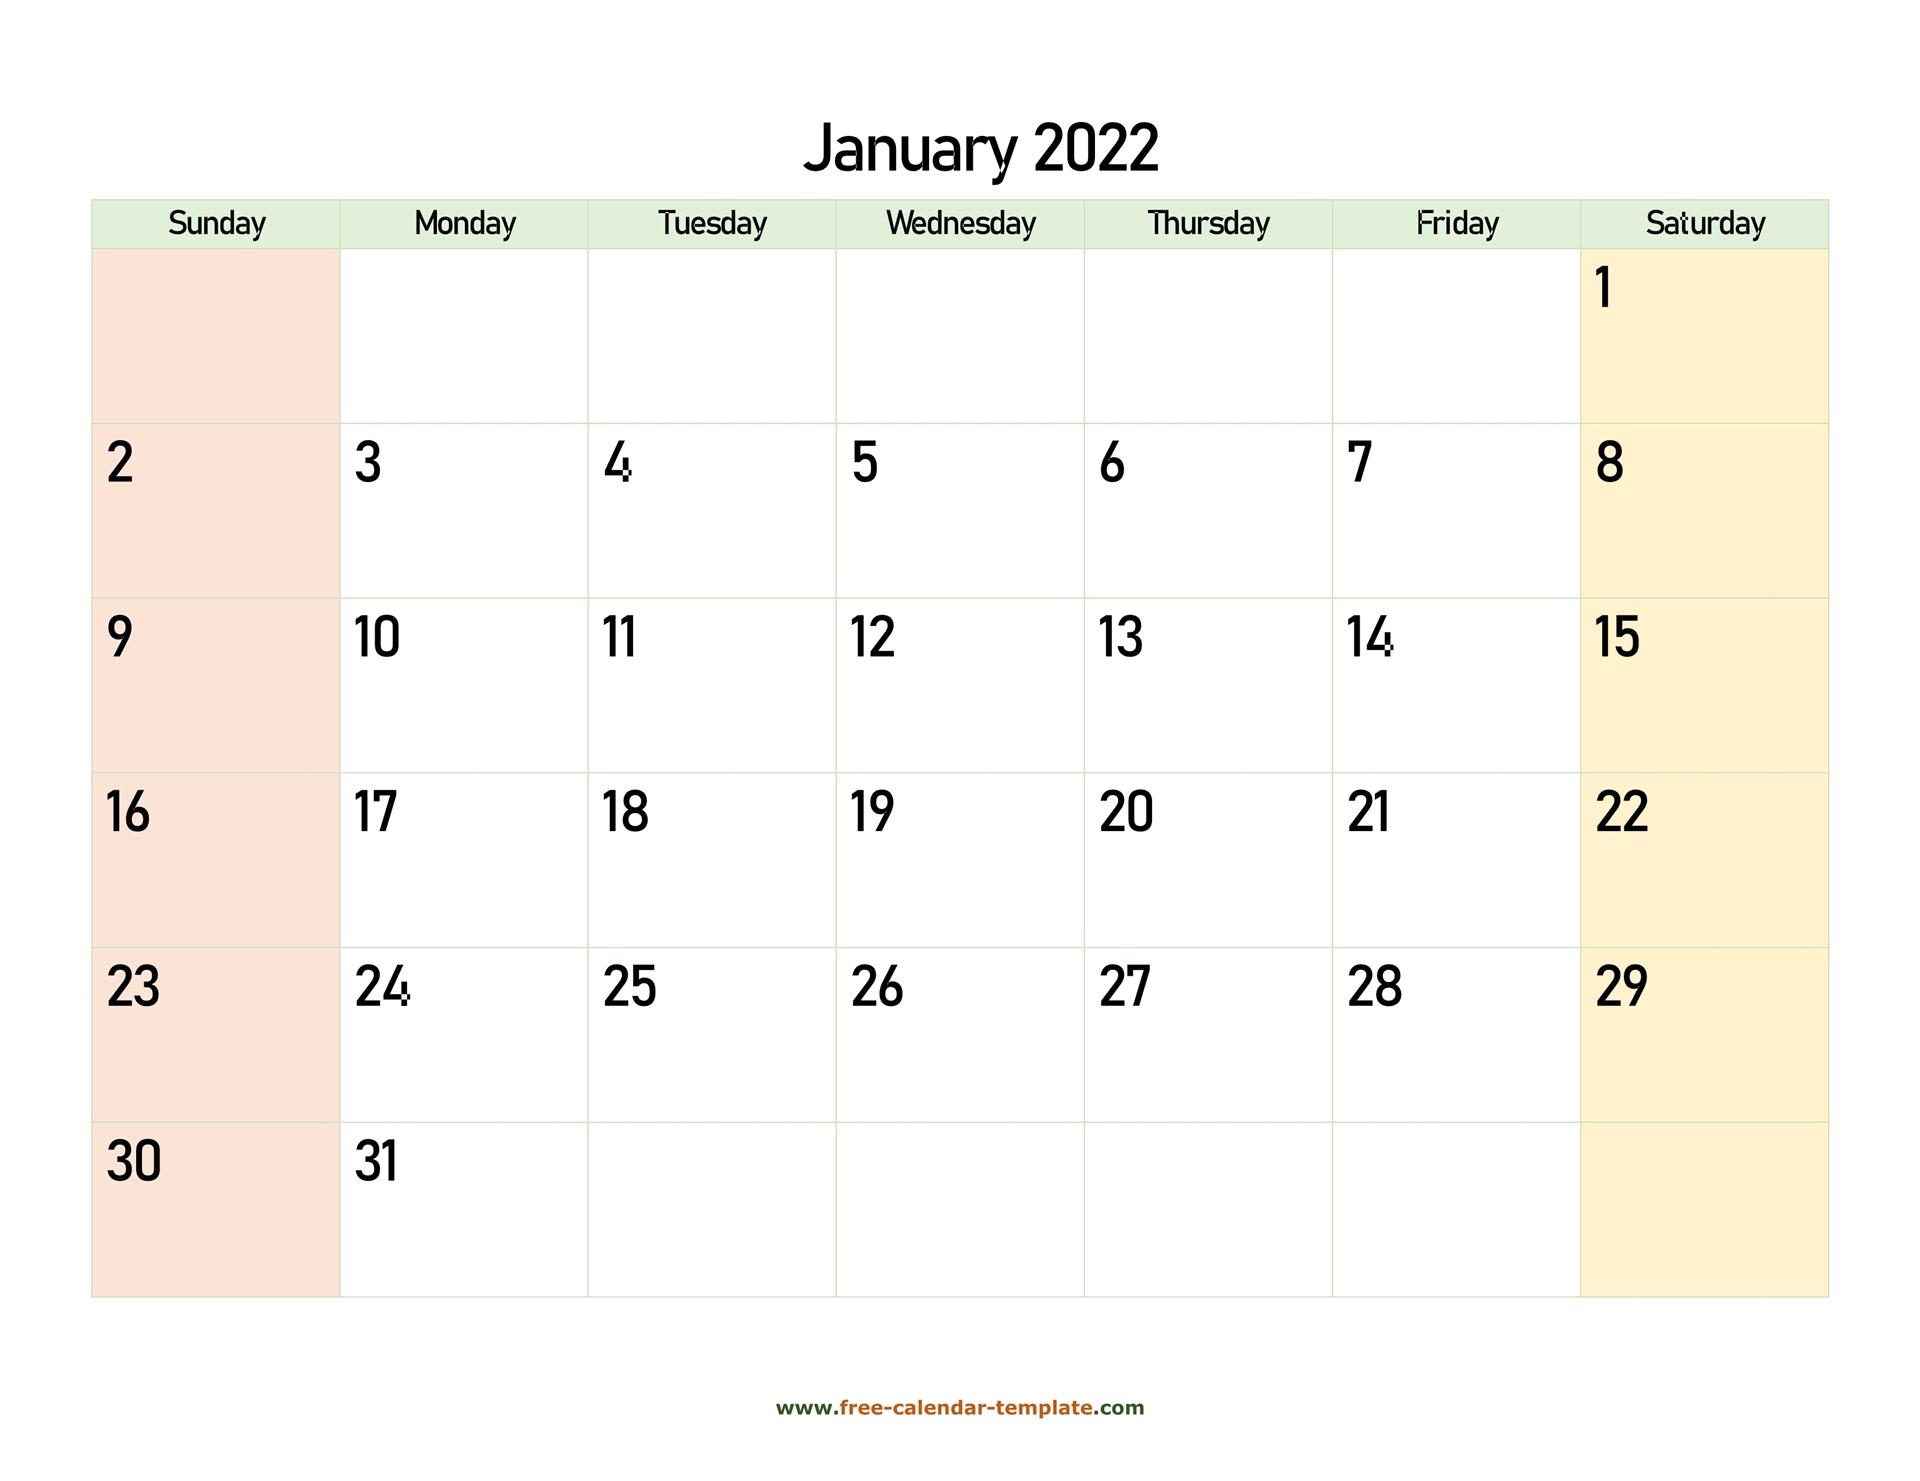 January 2022 Free Calendar Tempplate | Free Calendar Regarding January Calendar Printable 2022